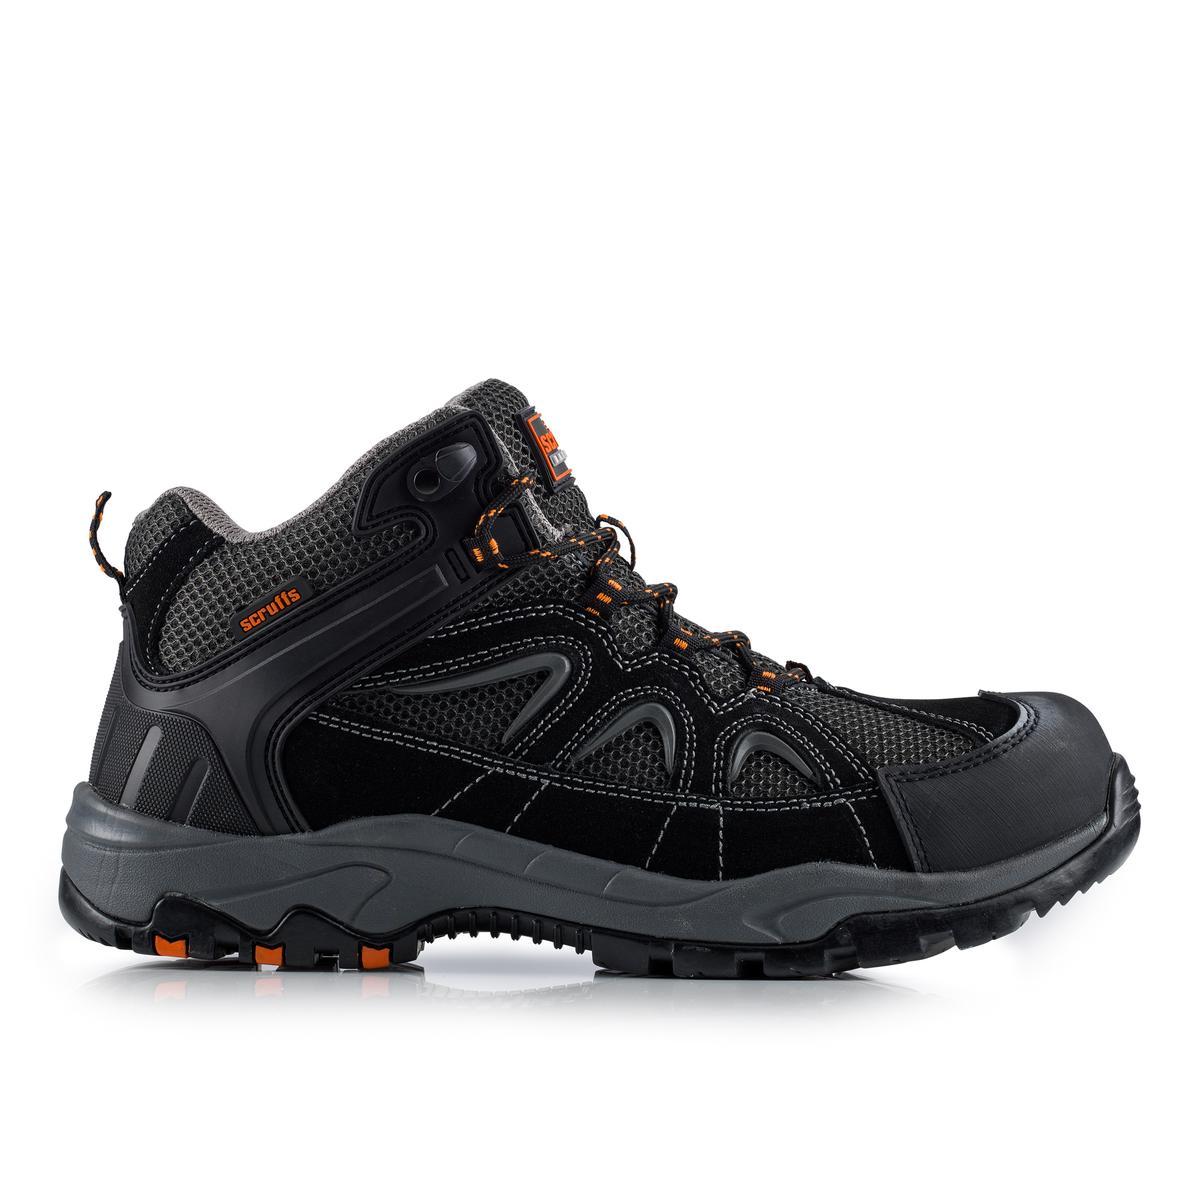 239aeb88173 Scruffs Cheviot Safety Boots